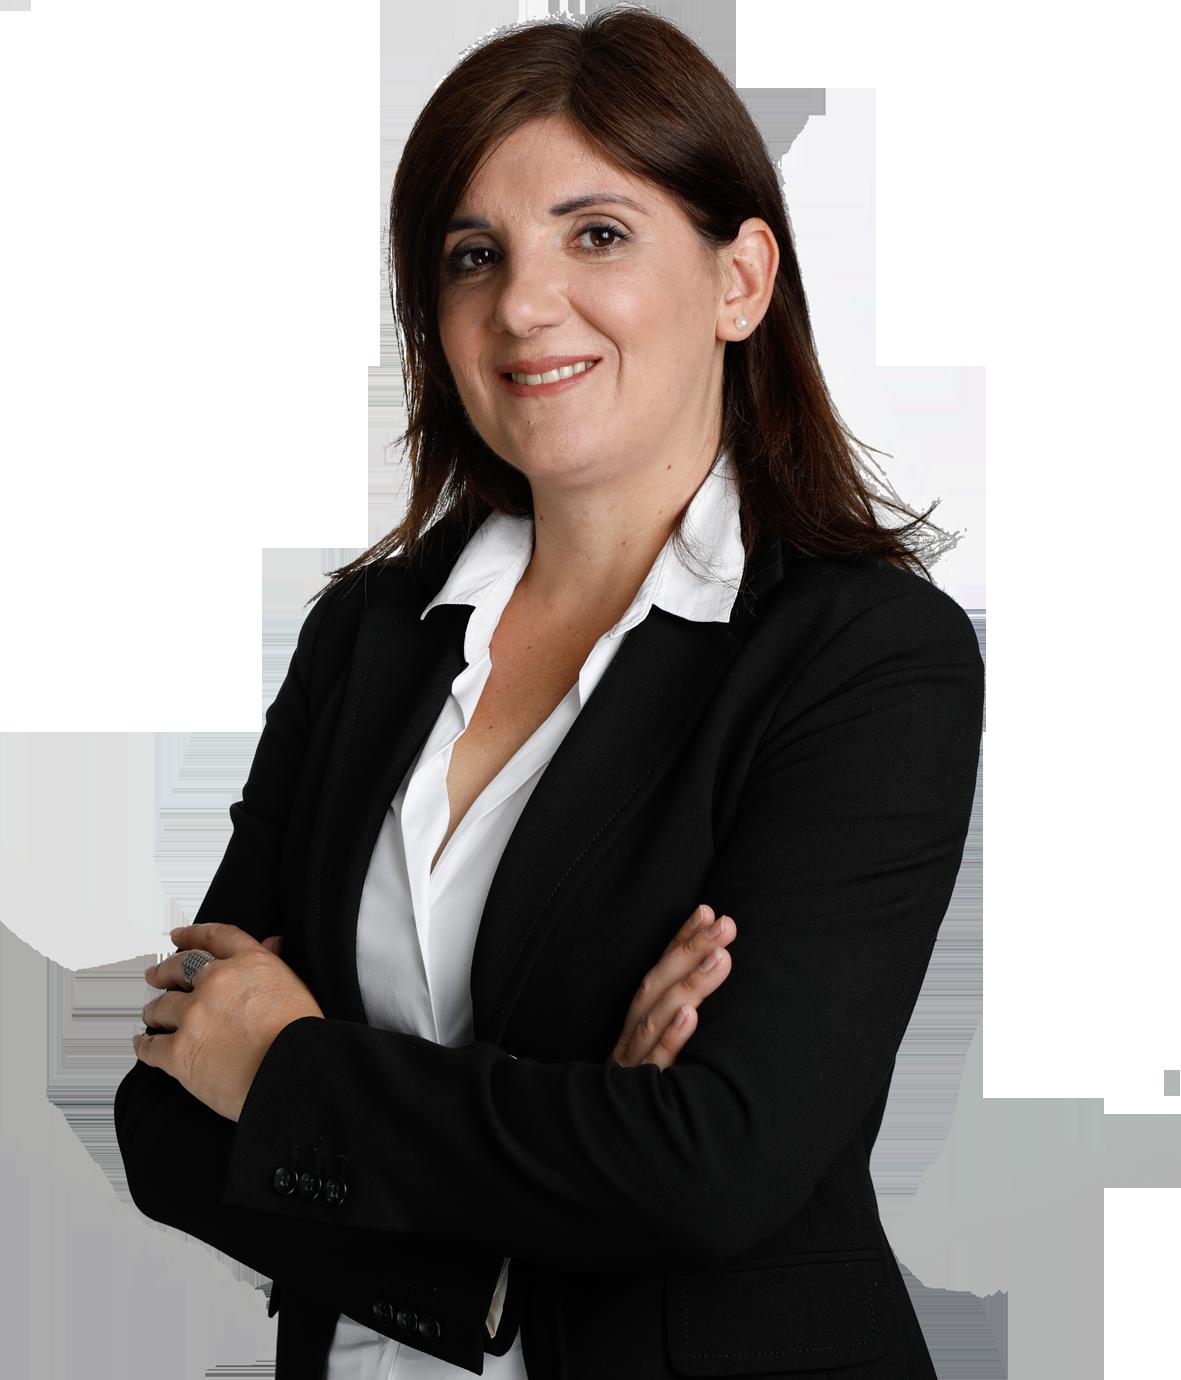 Profilbild Eva Schmitzberger - virtuelle Assistentin